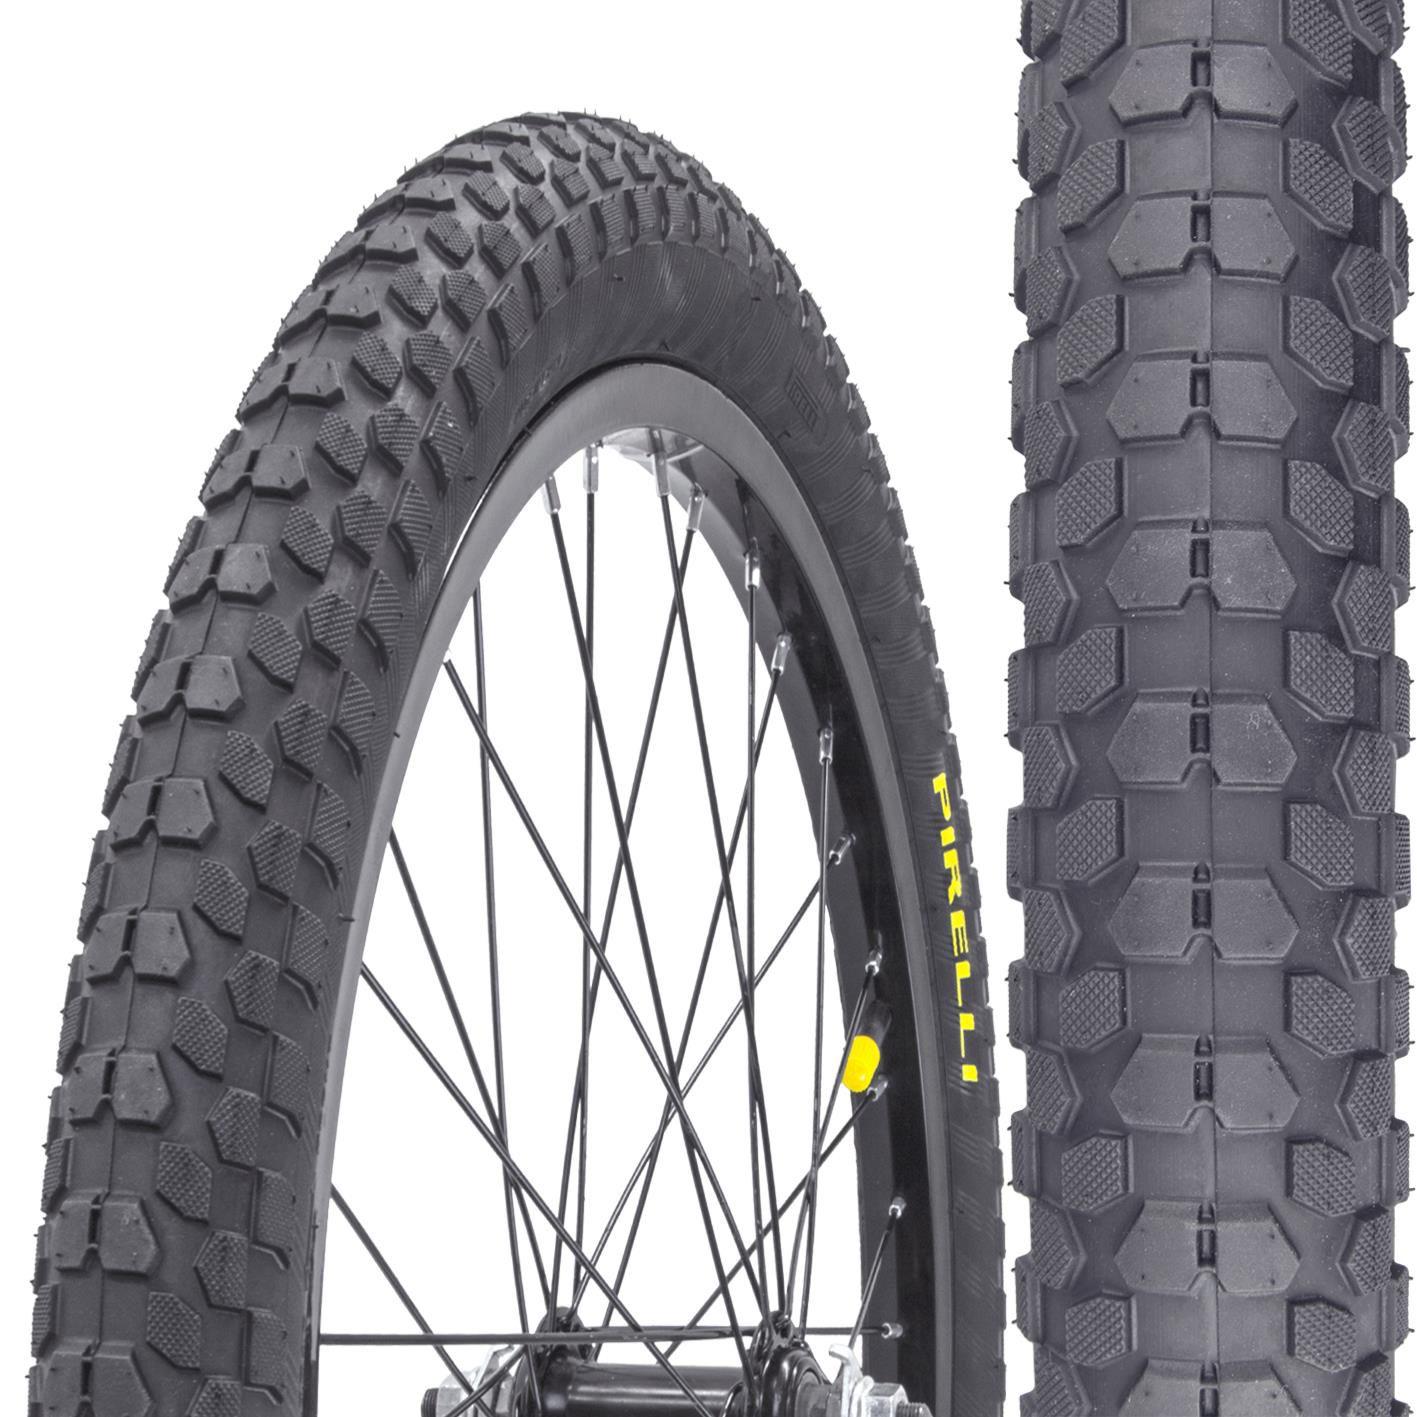 Pneu Pirelli Scorpion Bmx Aro 20 X 2.125 Bike Cross